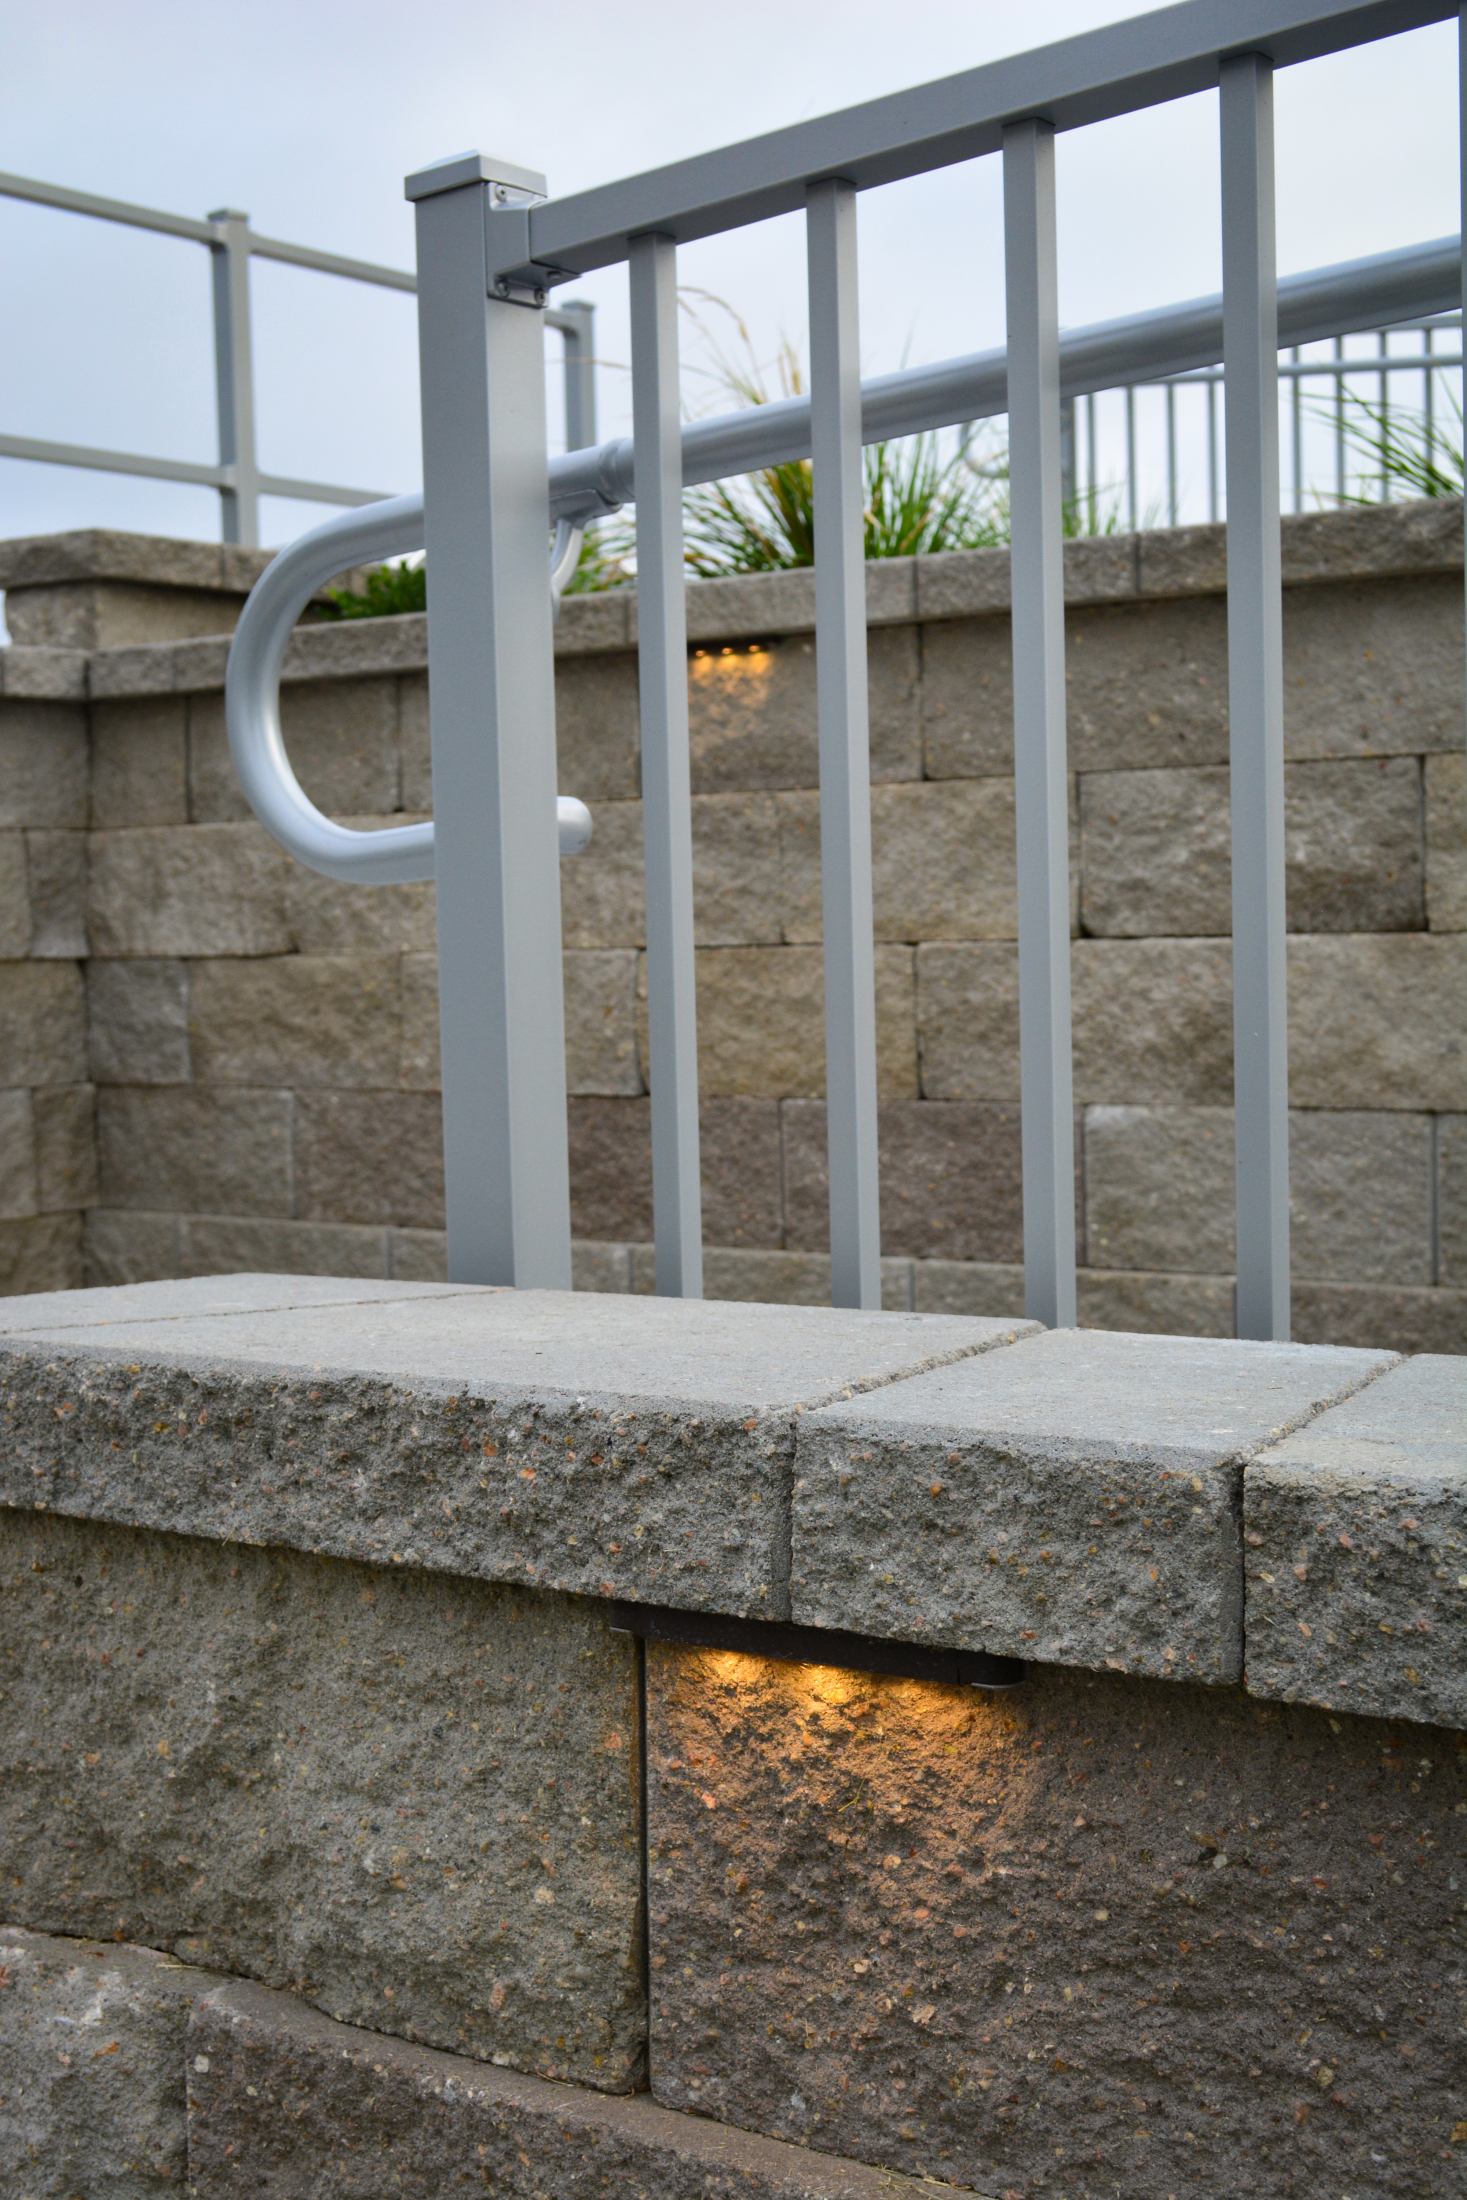 Access-wall-4-1